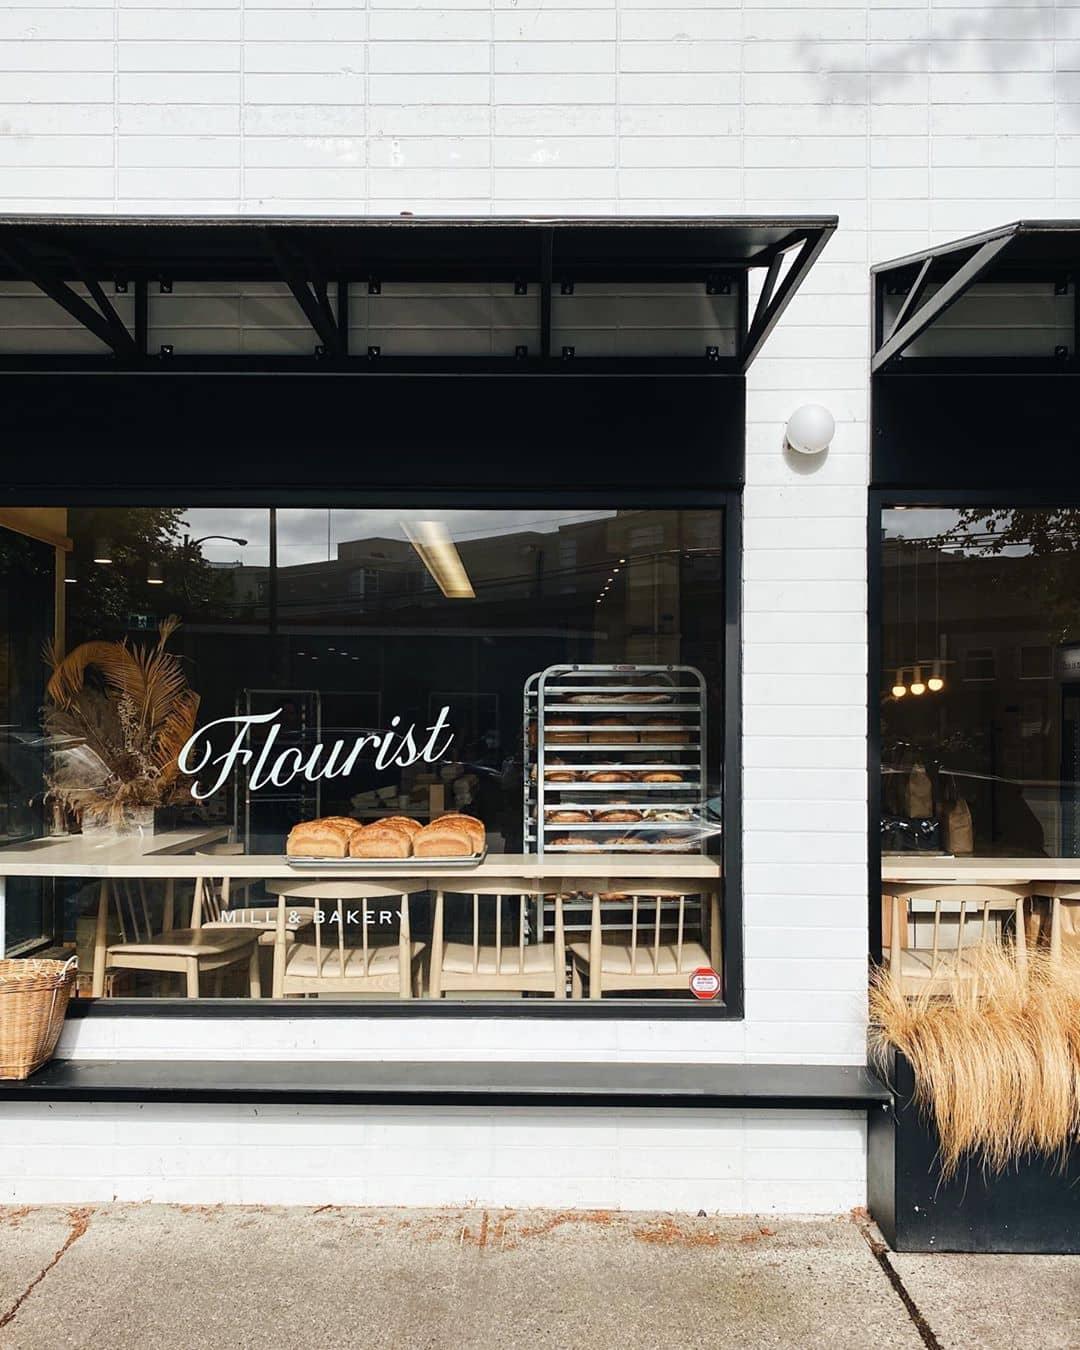 Exterior of Flourist Shop